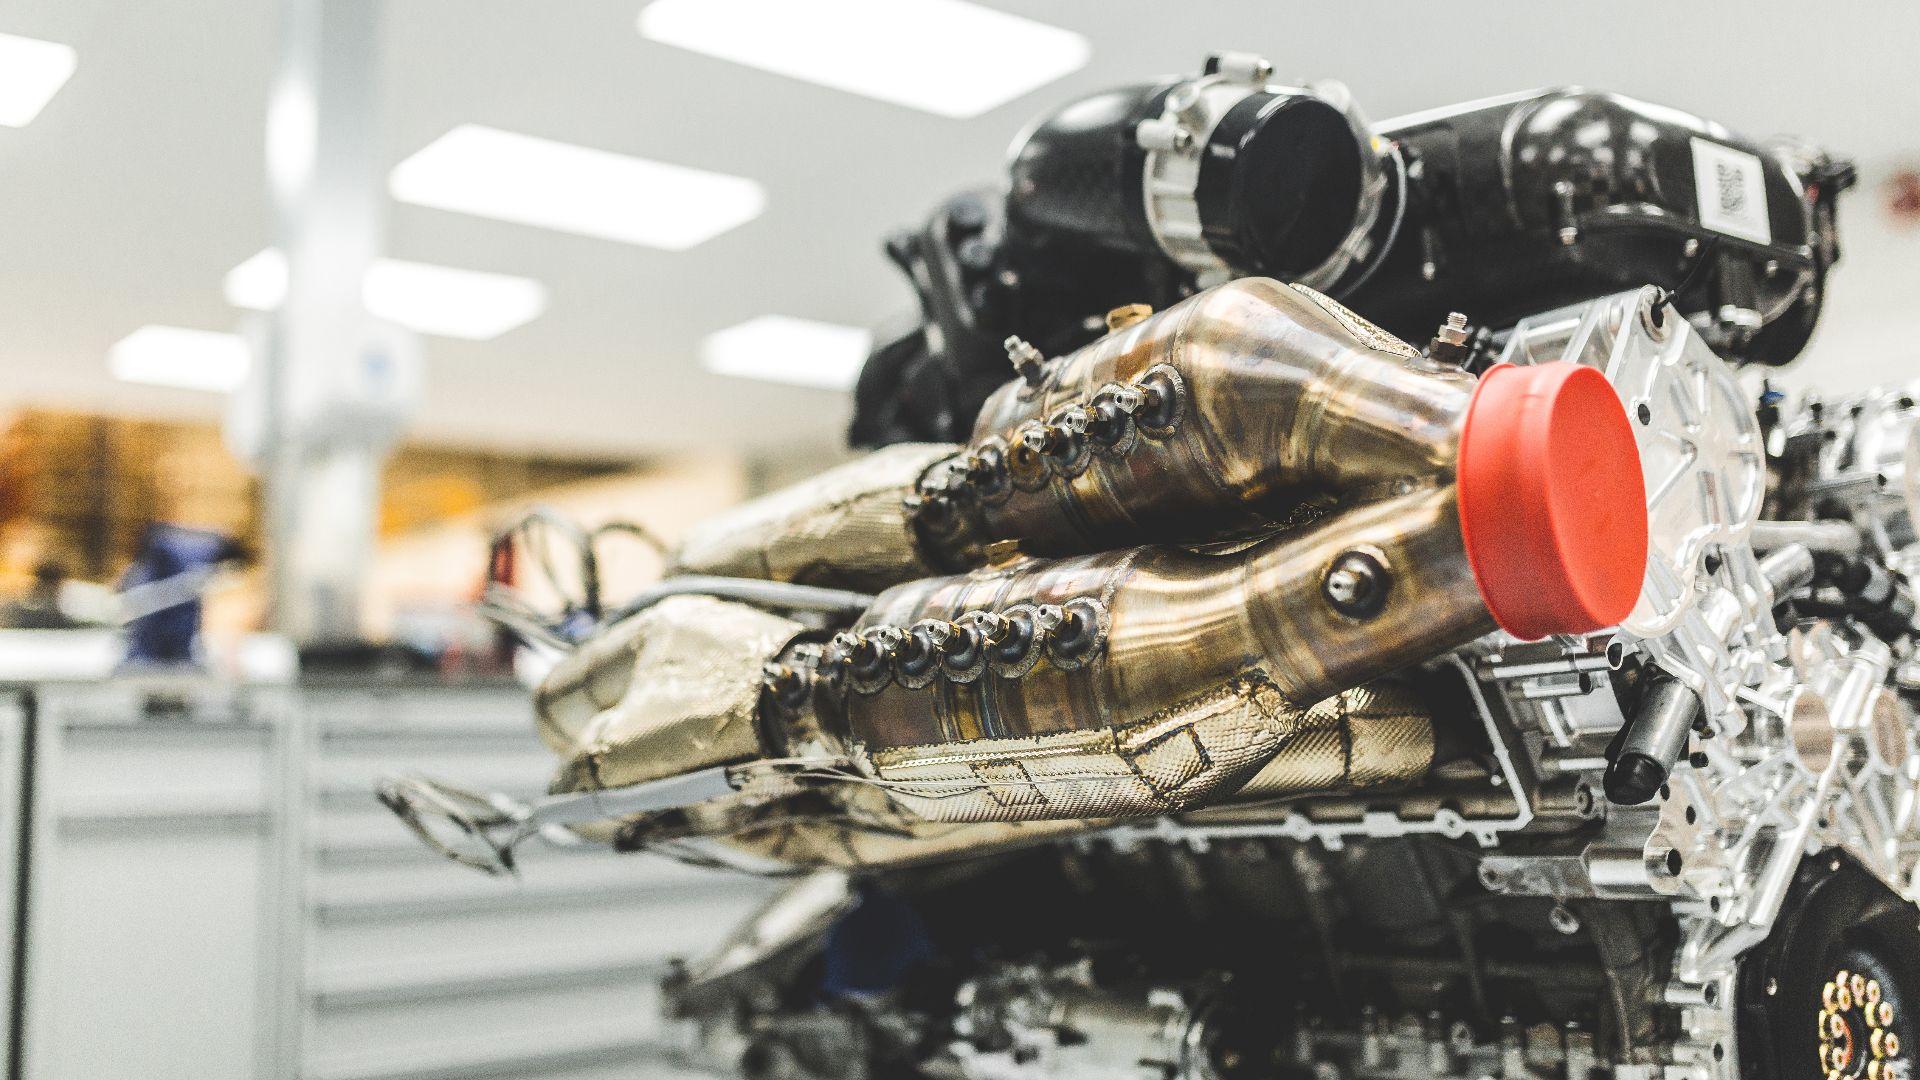 Aston Martin Valkyrie V12 Cosworth engine